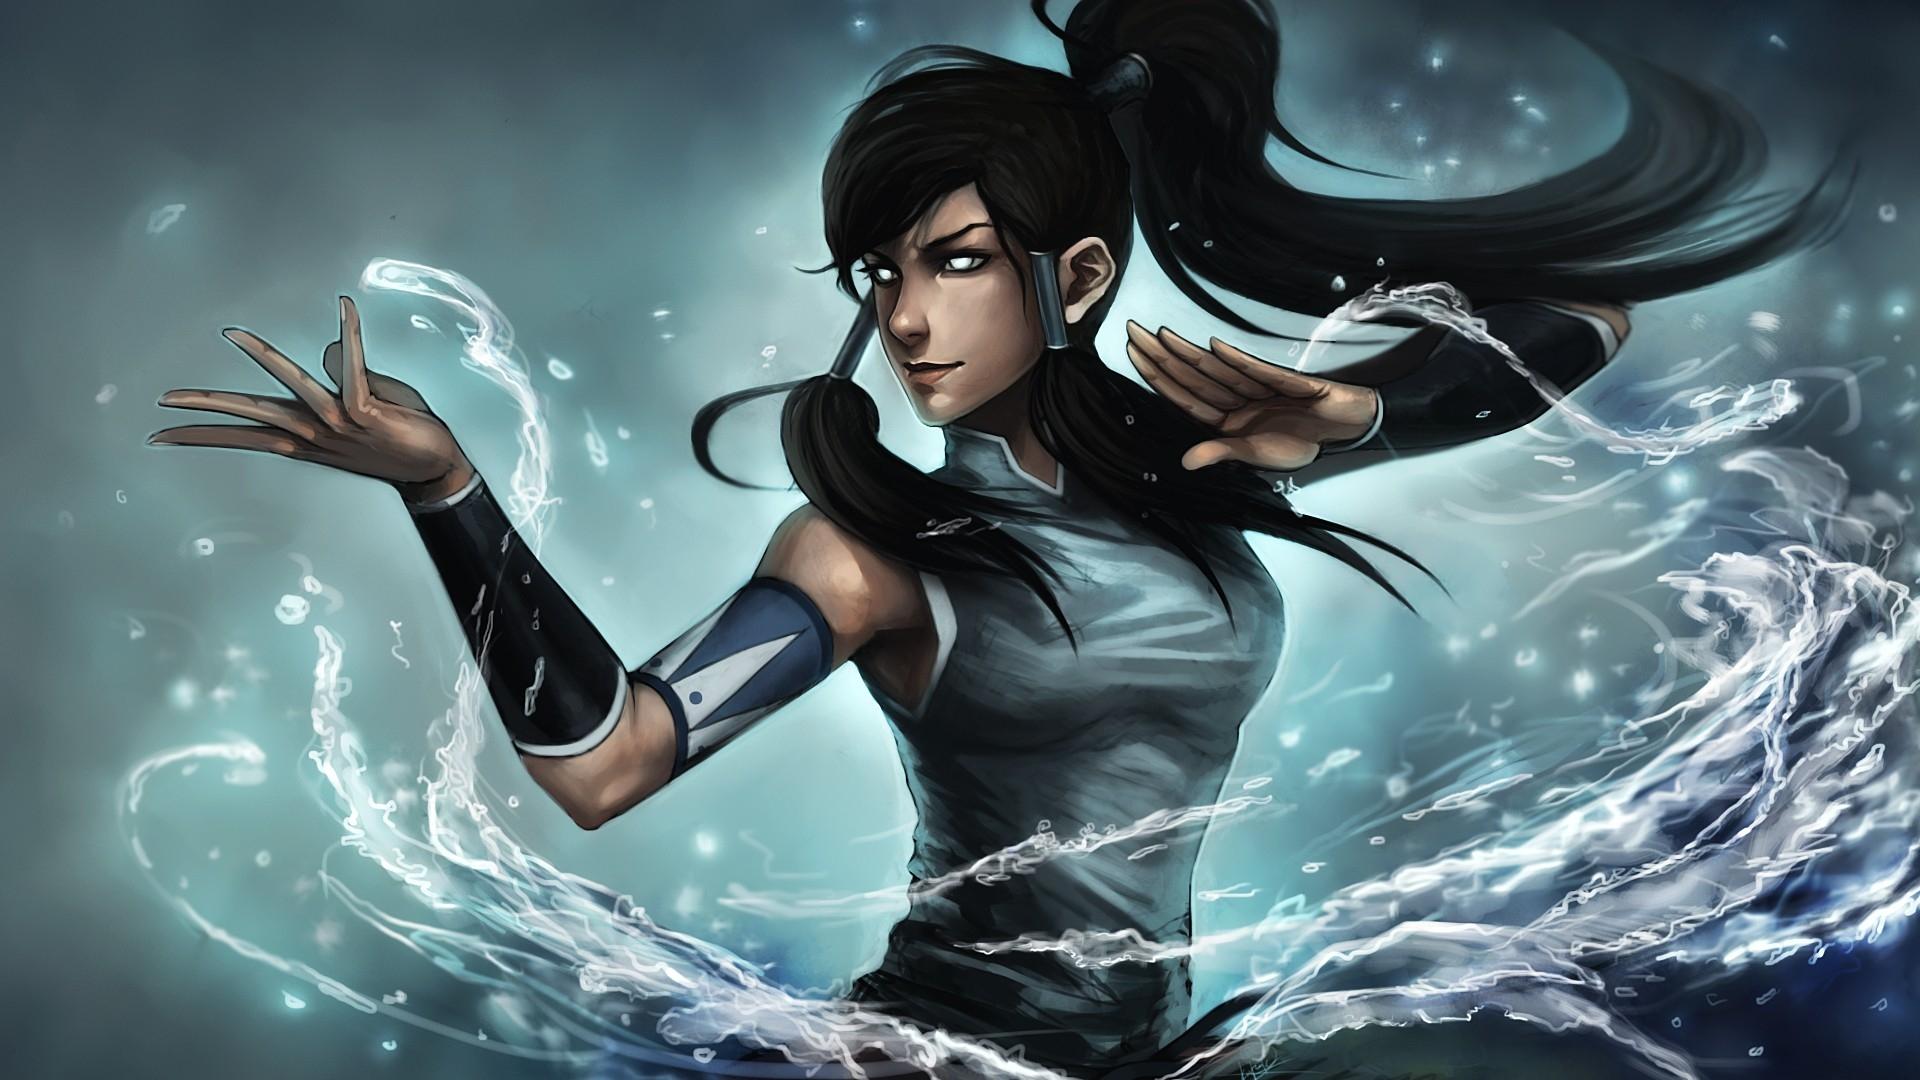 Background ID390628 1920x1080 Anime Avatar The Legend Of Korra 1920x1080